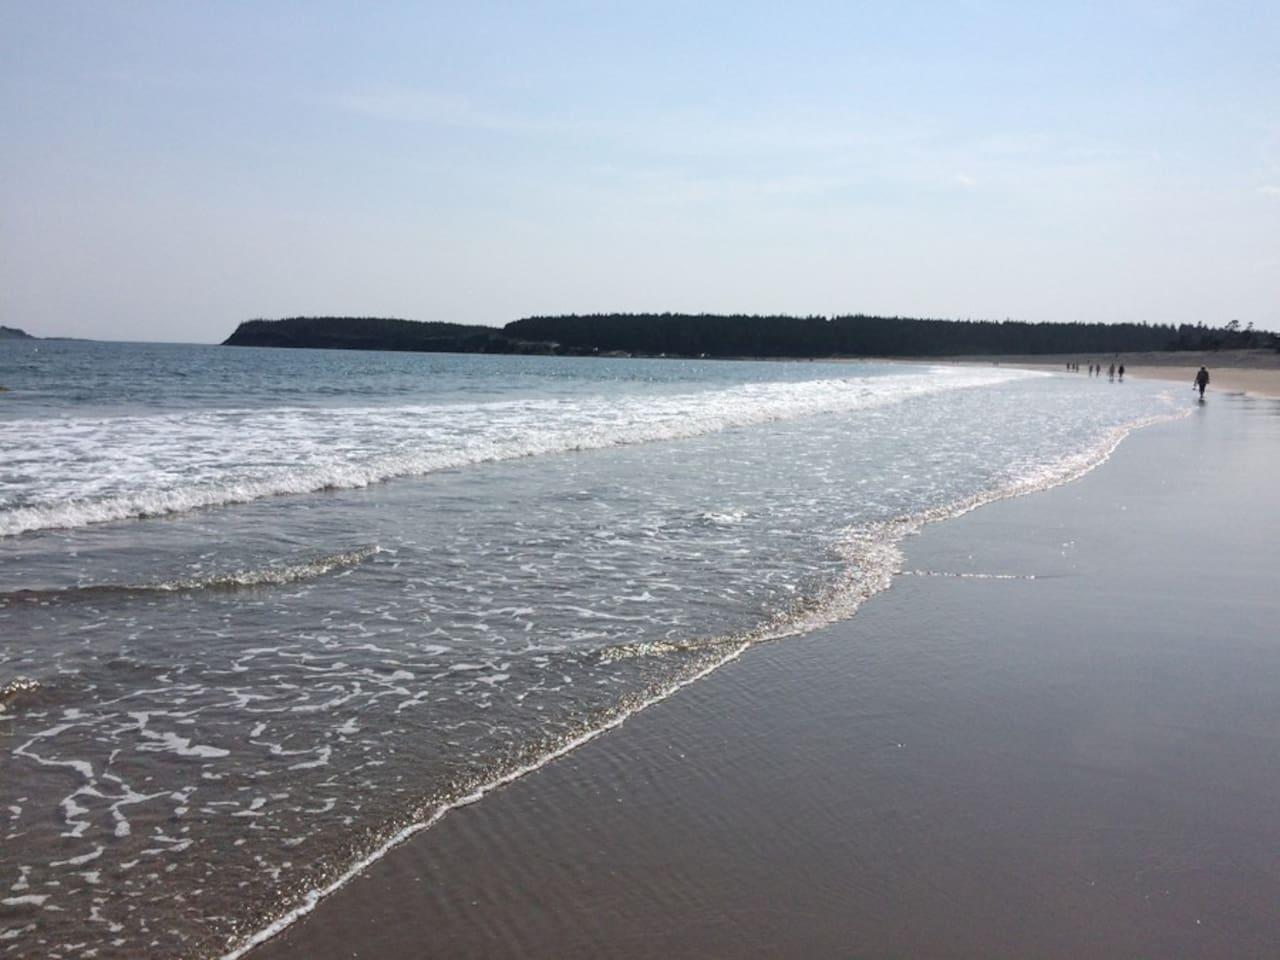 Hirtles beach